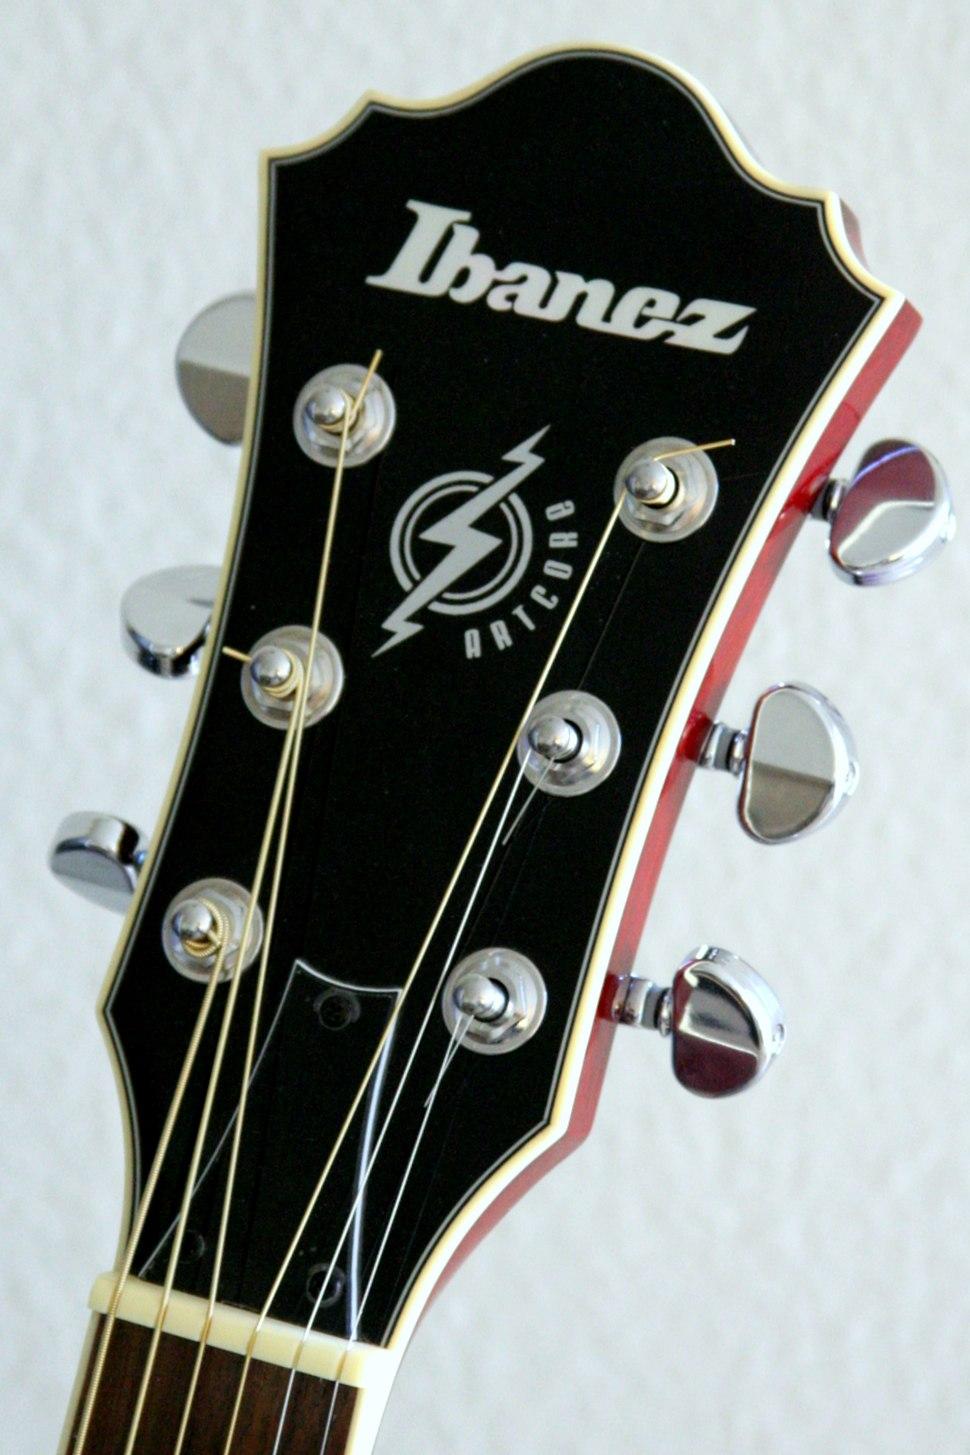 Ibanez Artcore headstock